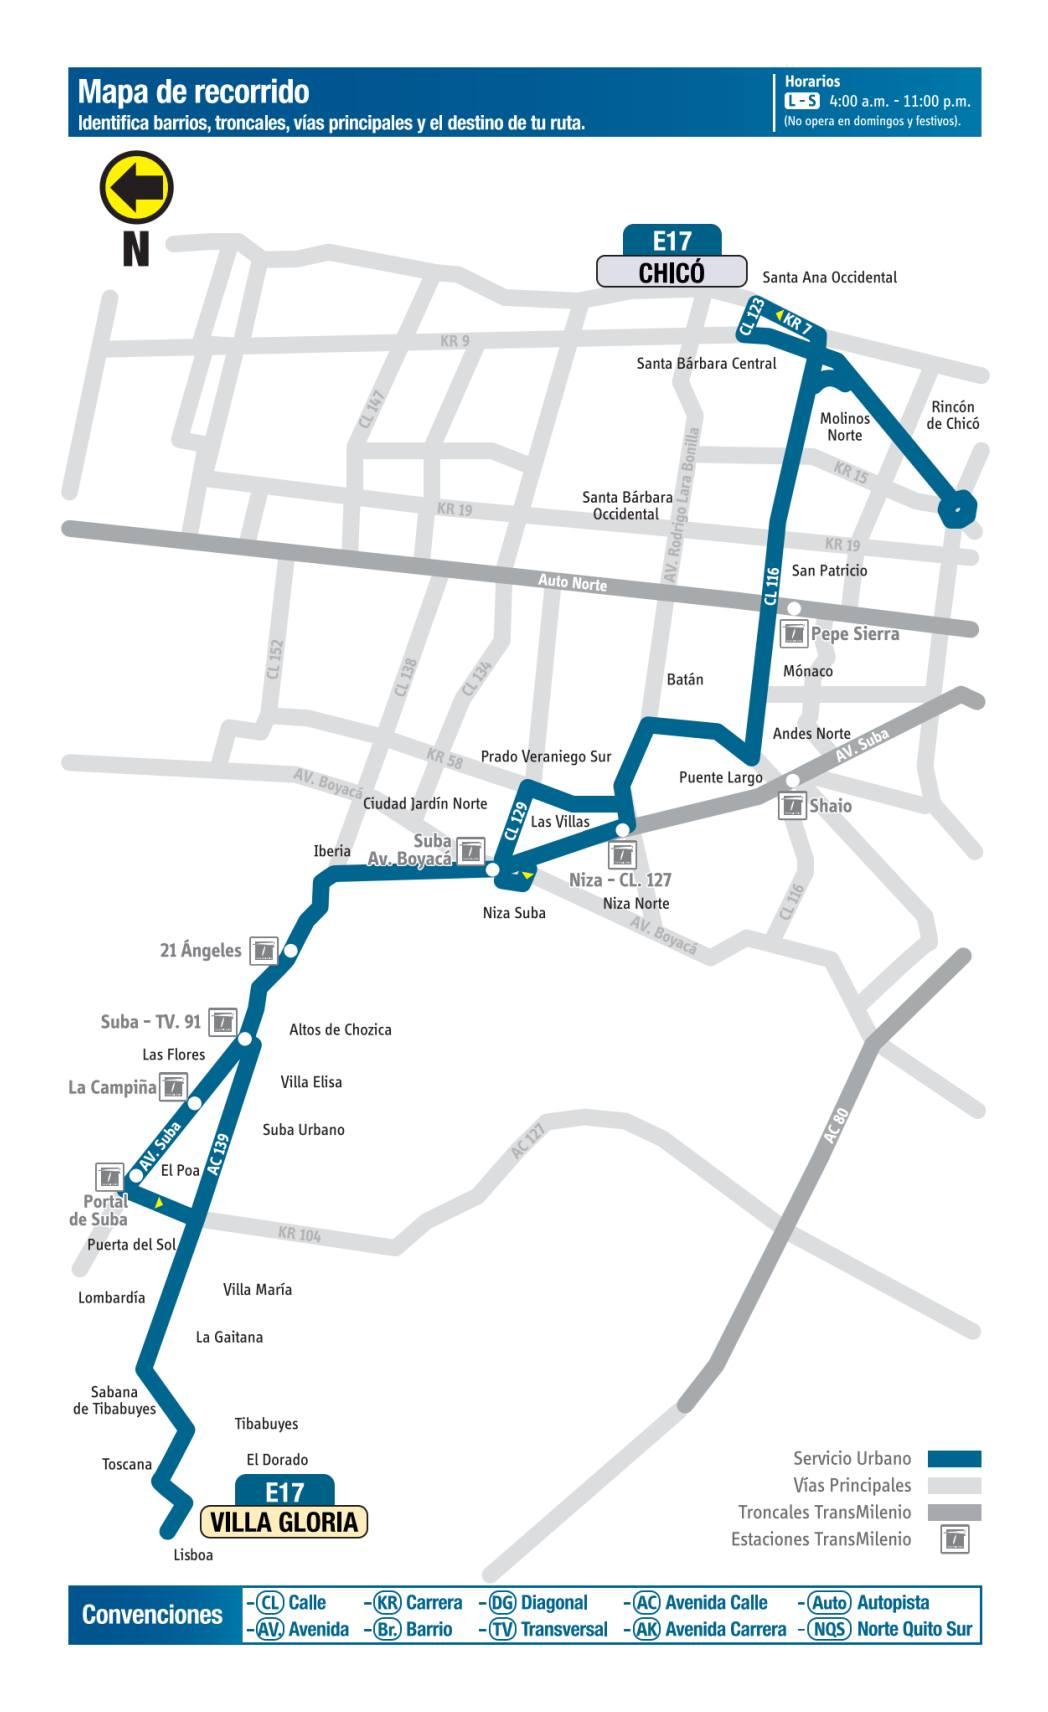 E17 Villa Gloria - Chicó, mapa bus urbano Bogotá